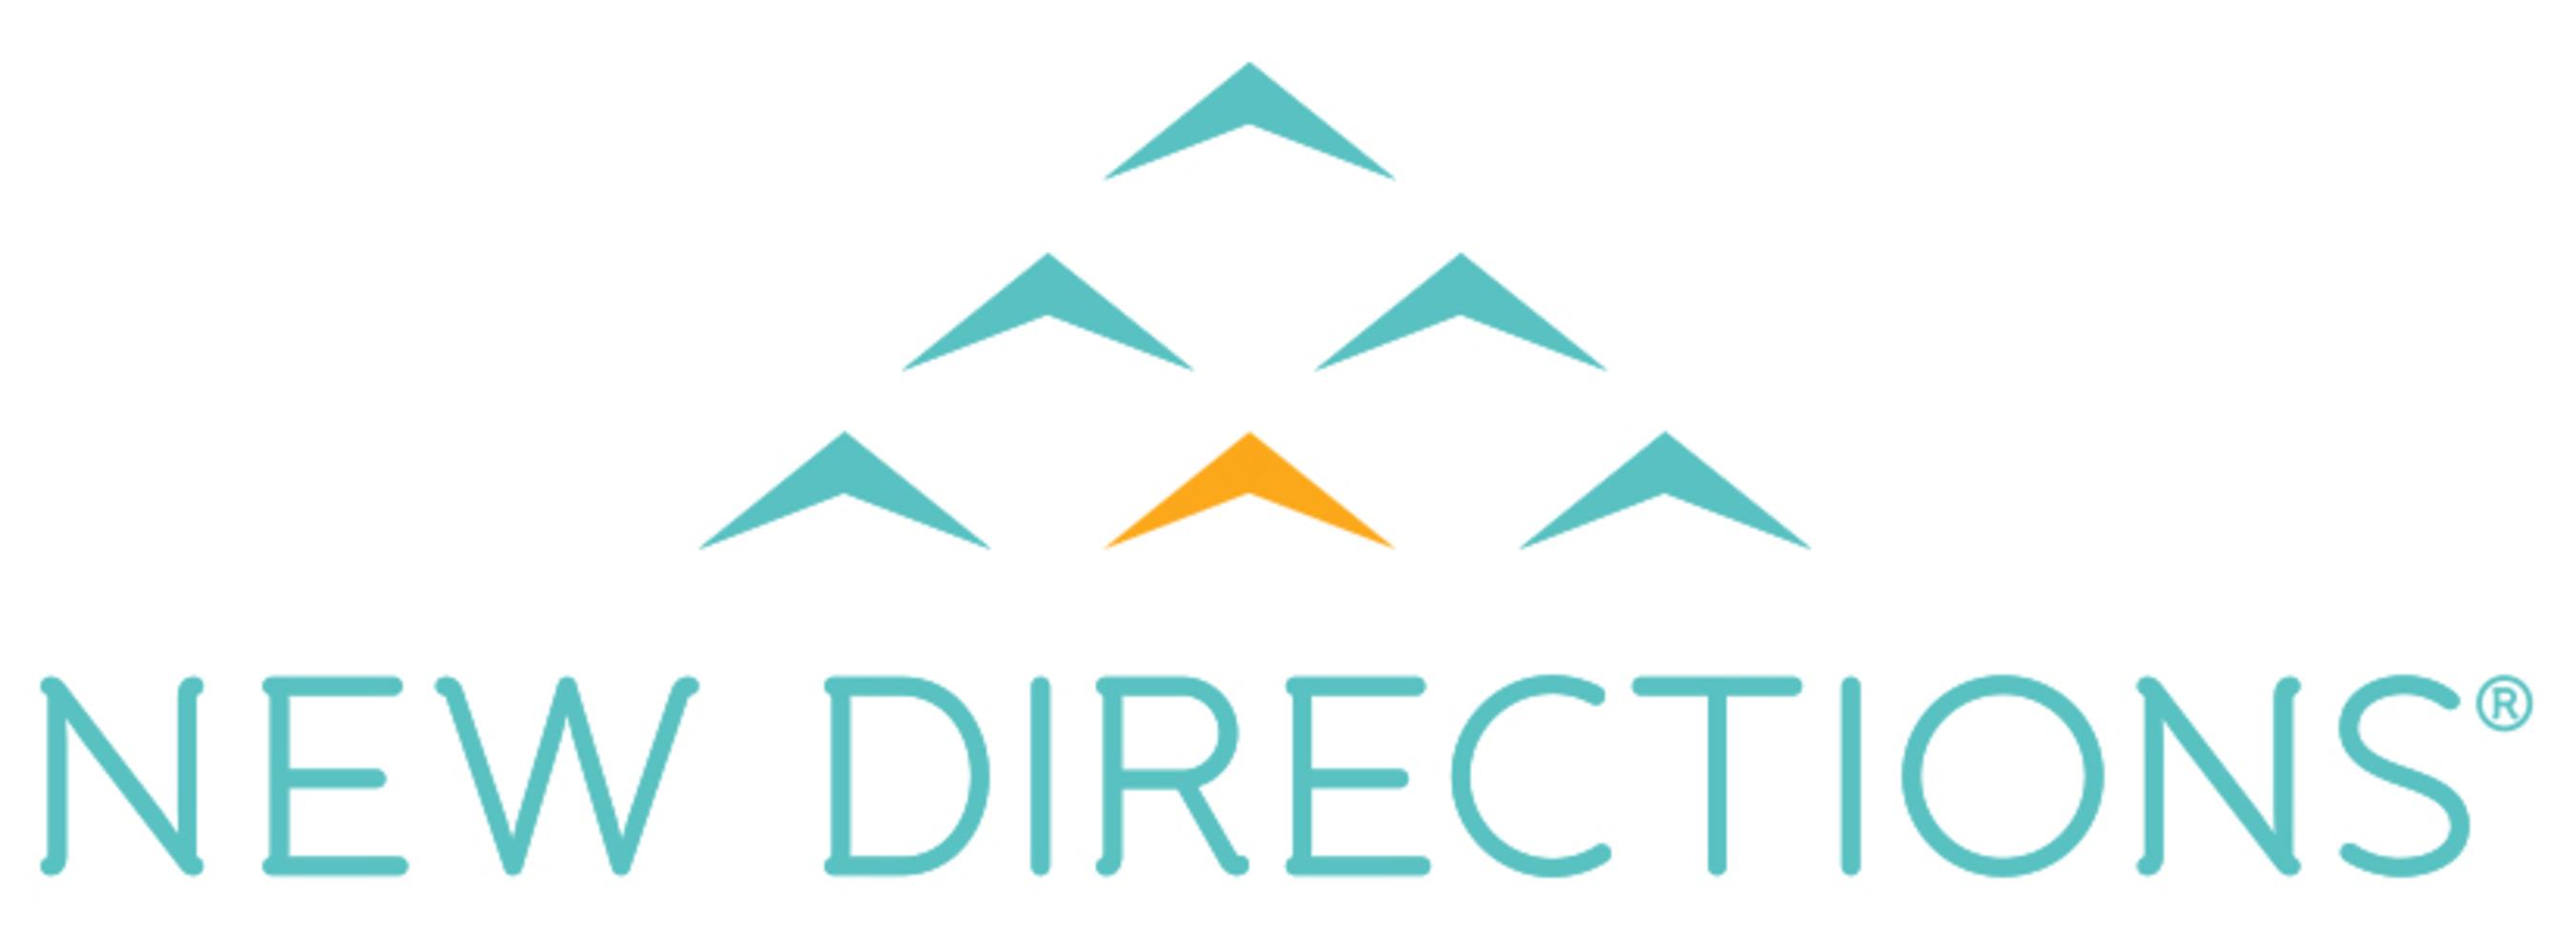 New Directions Behavioral Health logo